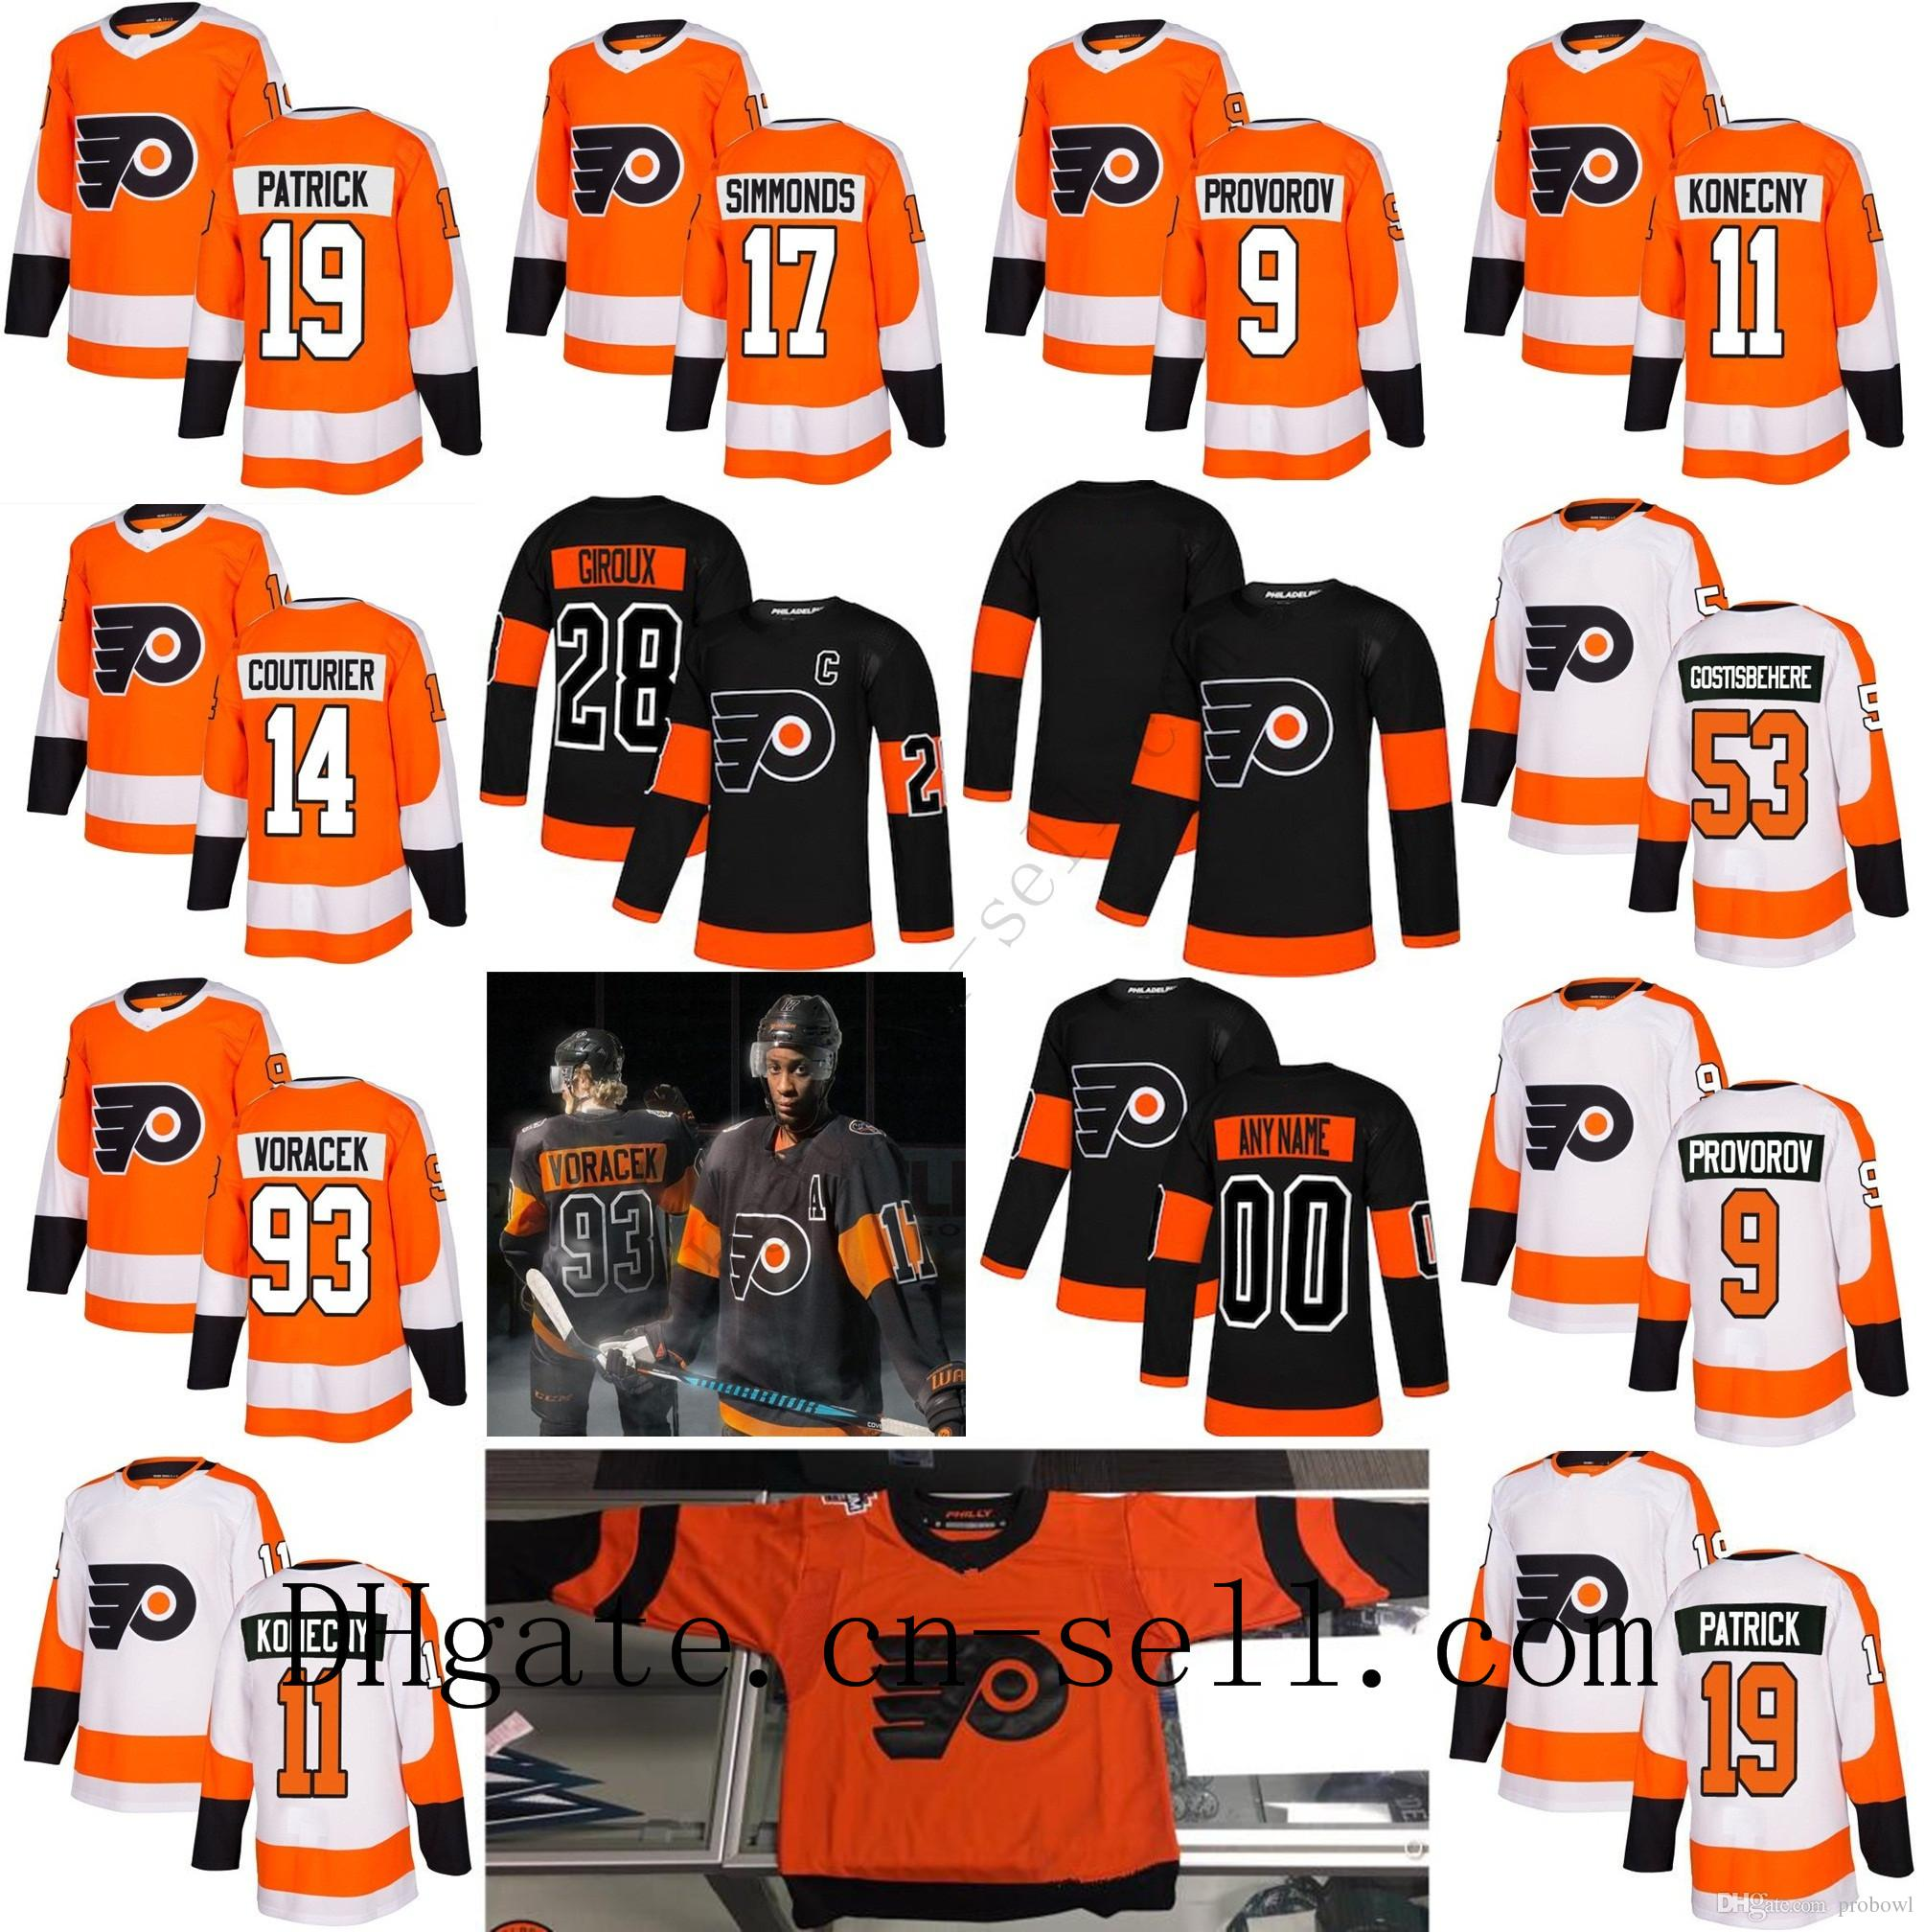 6663dcdce Carter Hart 2019 Stadium Series Philadelphia Flyers Mens Womens Youth 93  Voracek 53 Gostisbehere 17 Simmonds 28 Claude Giroux Hockey Jersey  Philadelphia ...